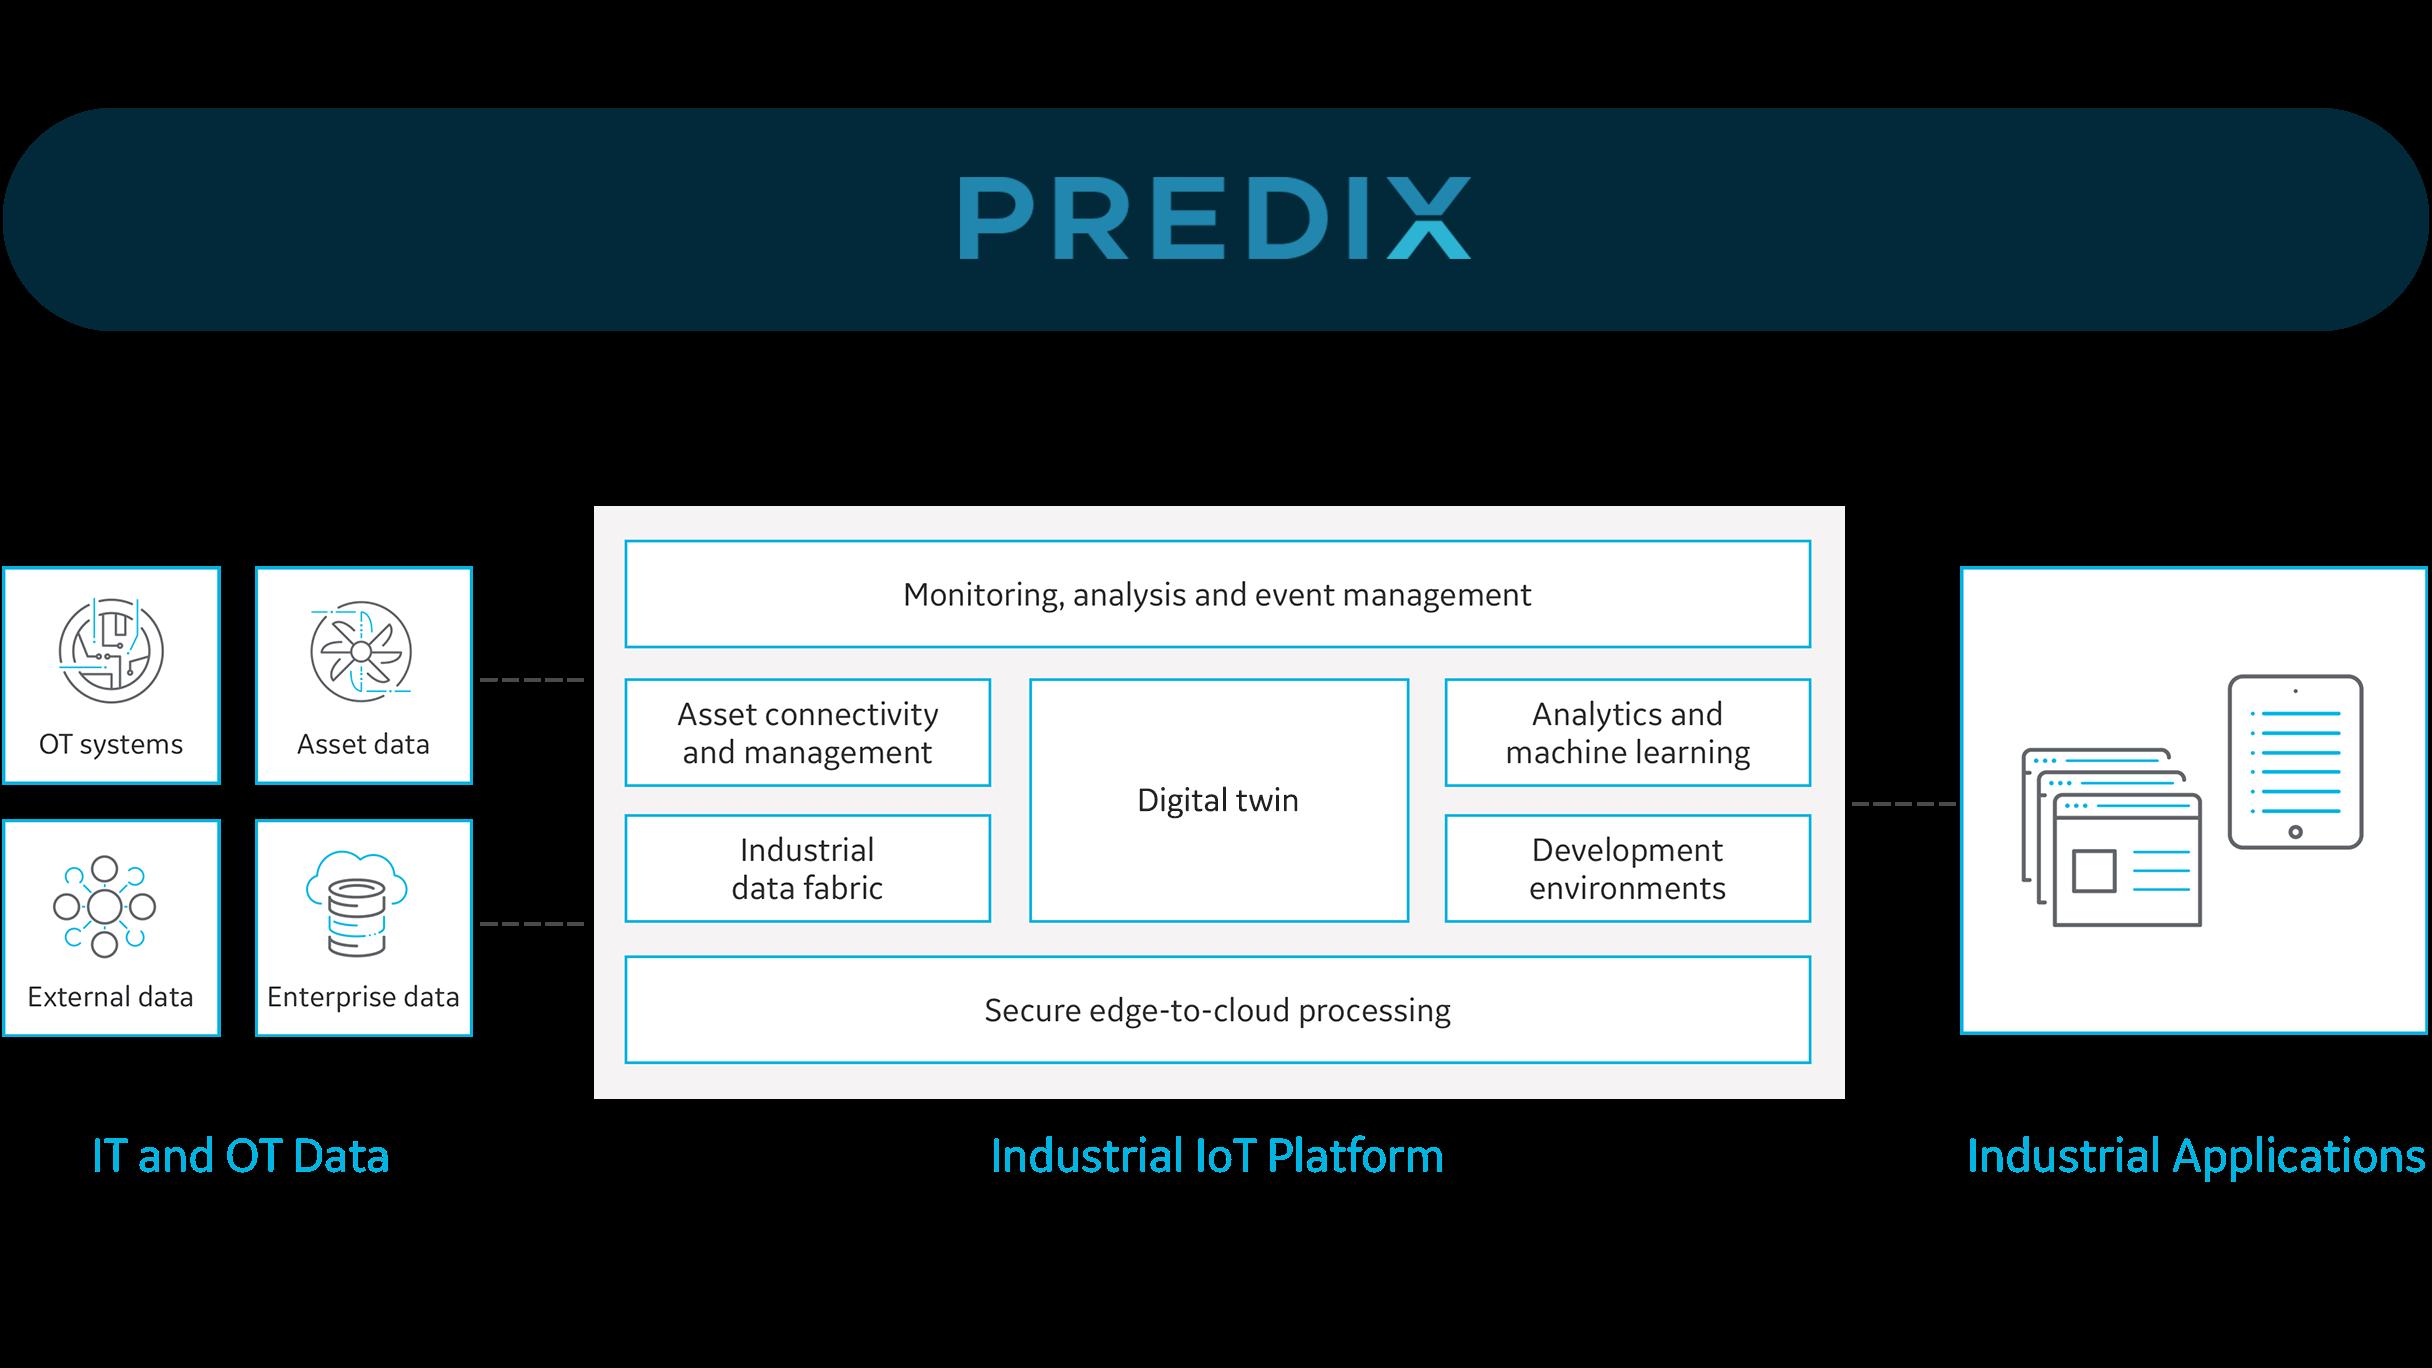 infographic-predix-platform-v2-2432x1368.png